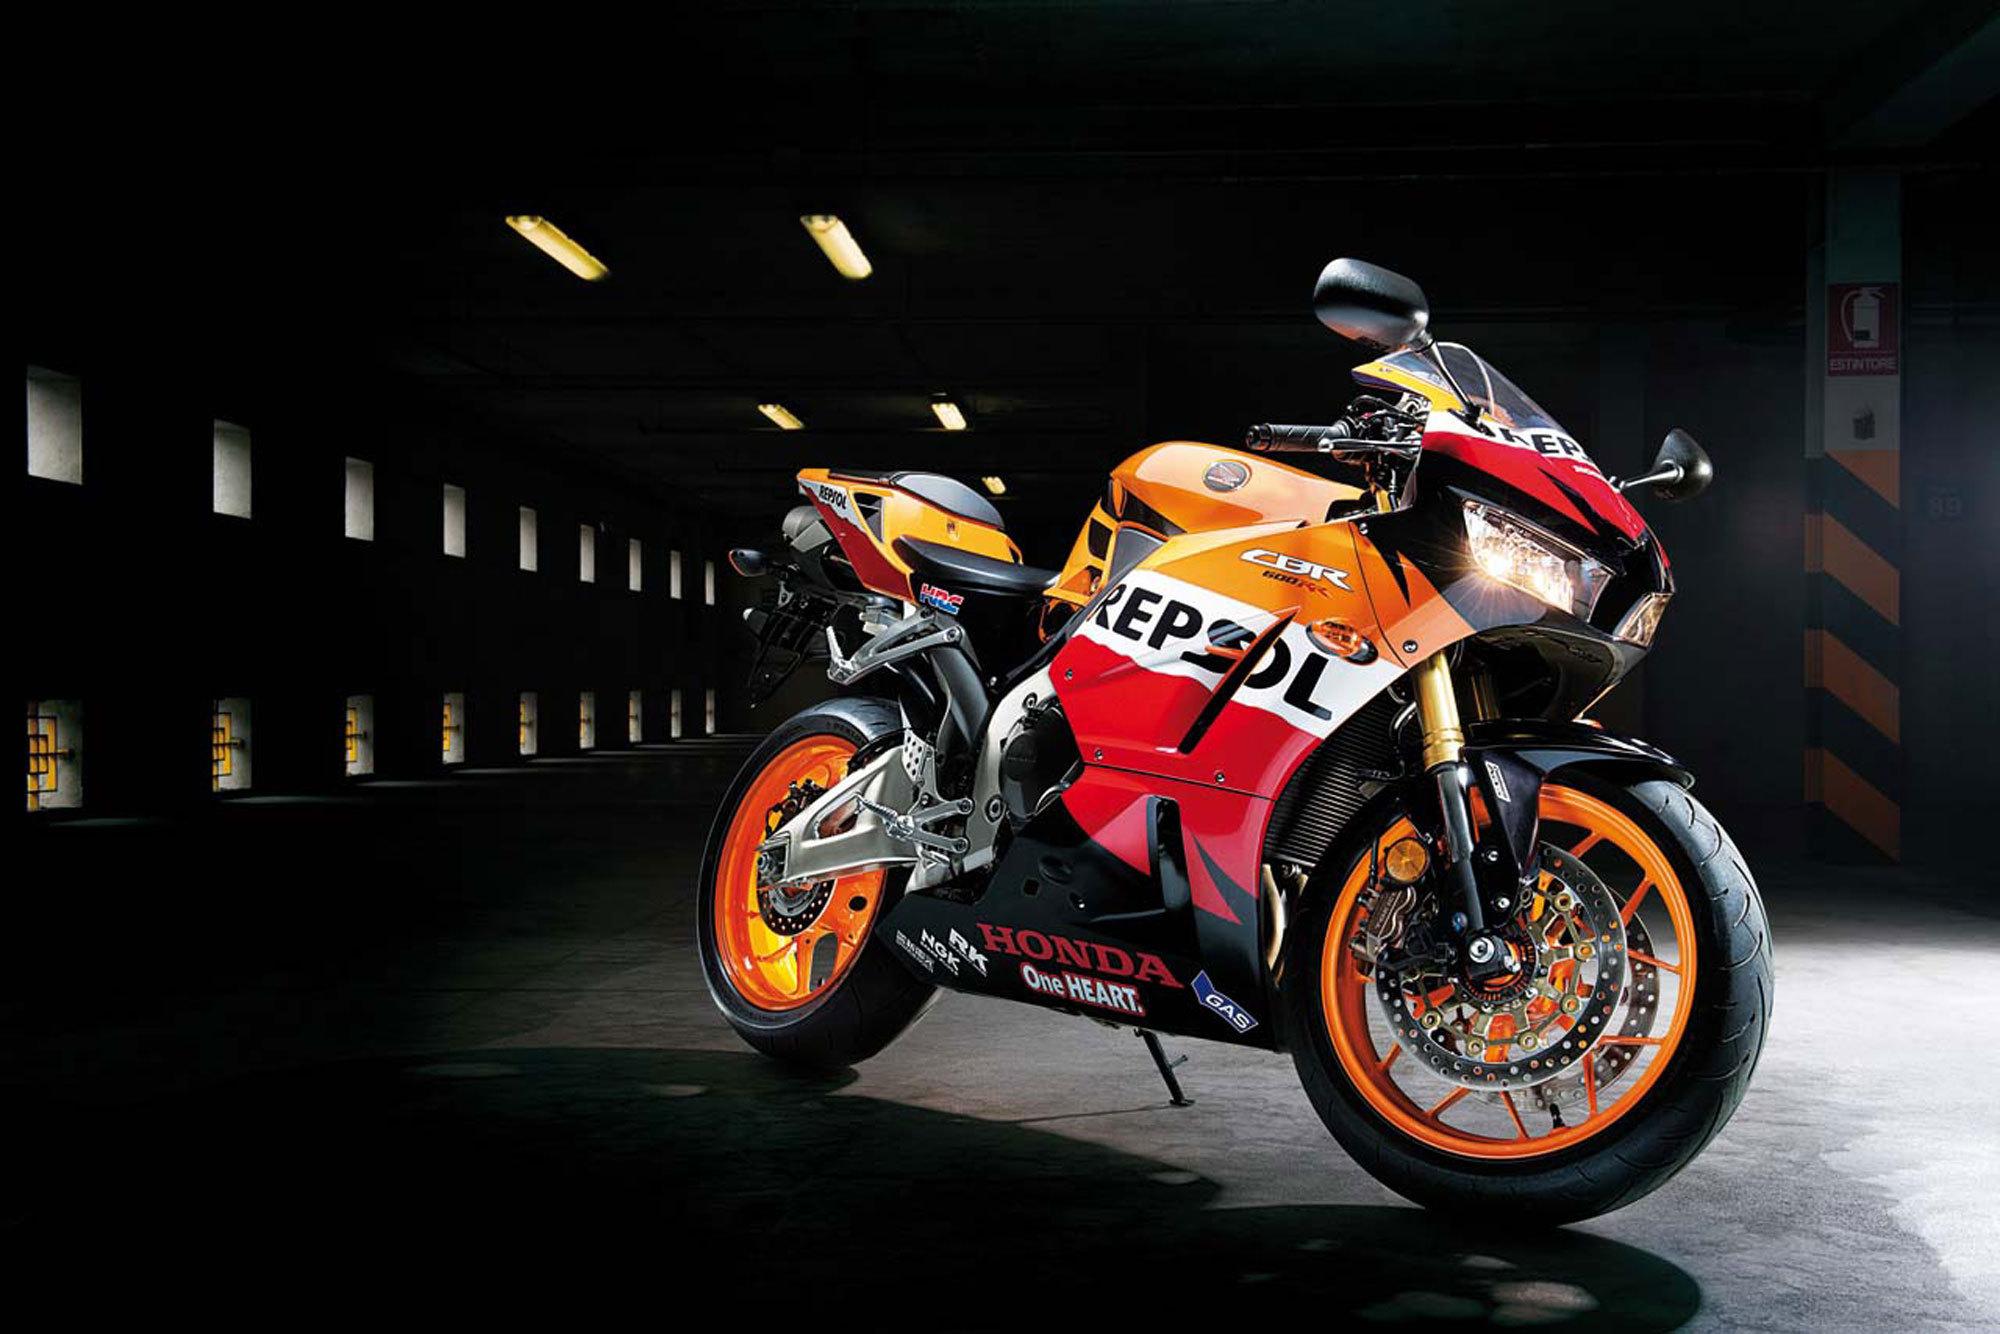 Beautiful Bike Honda Cbr 600 Rr Wallpapers And Images Wallpapers